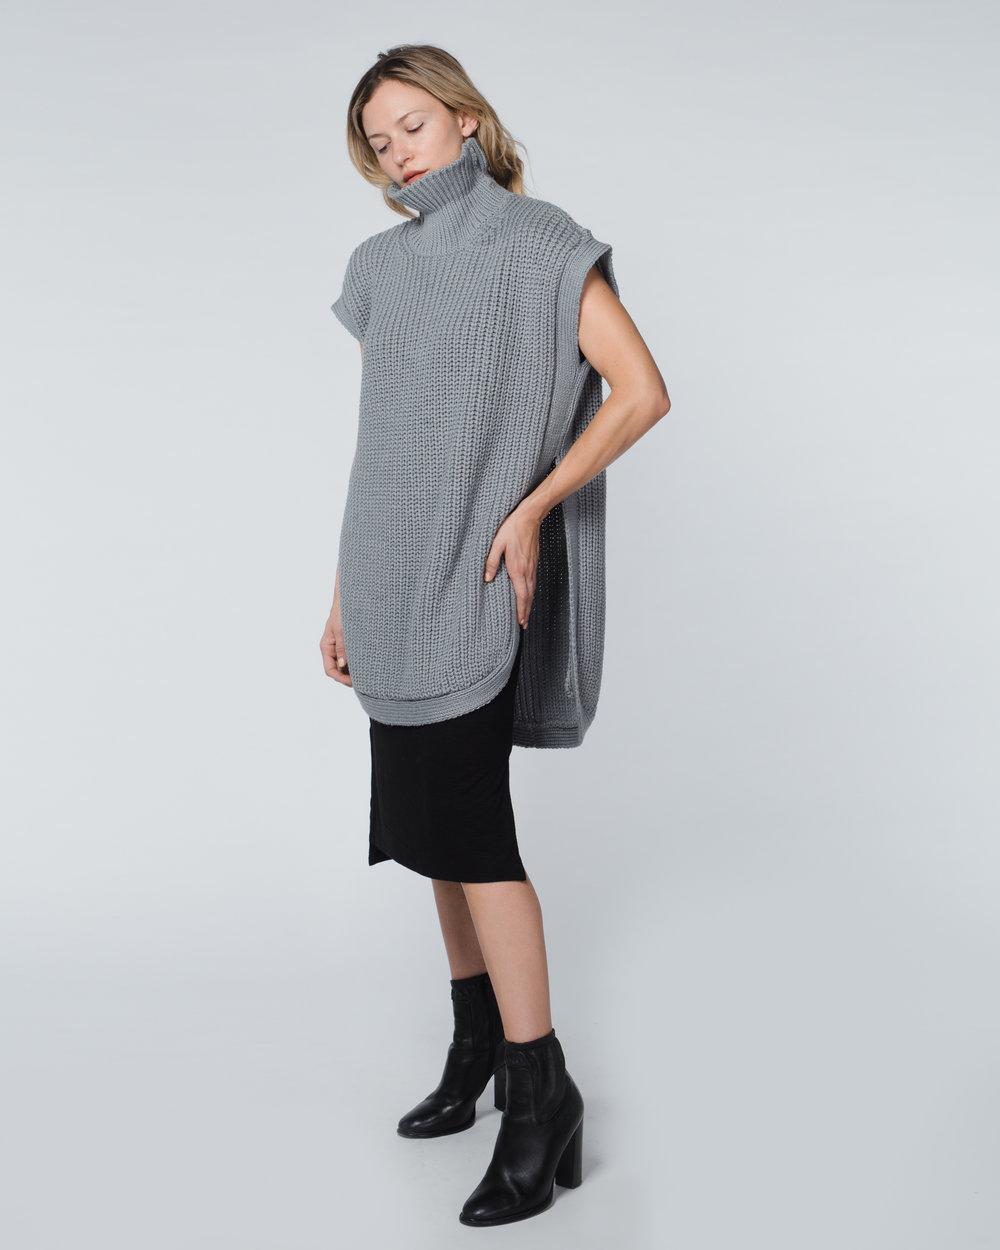 1x1-agoraphobia-sleevless-turtleneck-sweater-sharkskin-gray